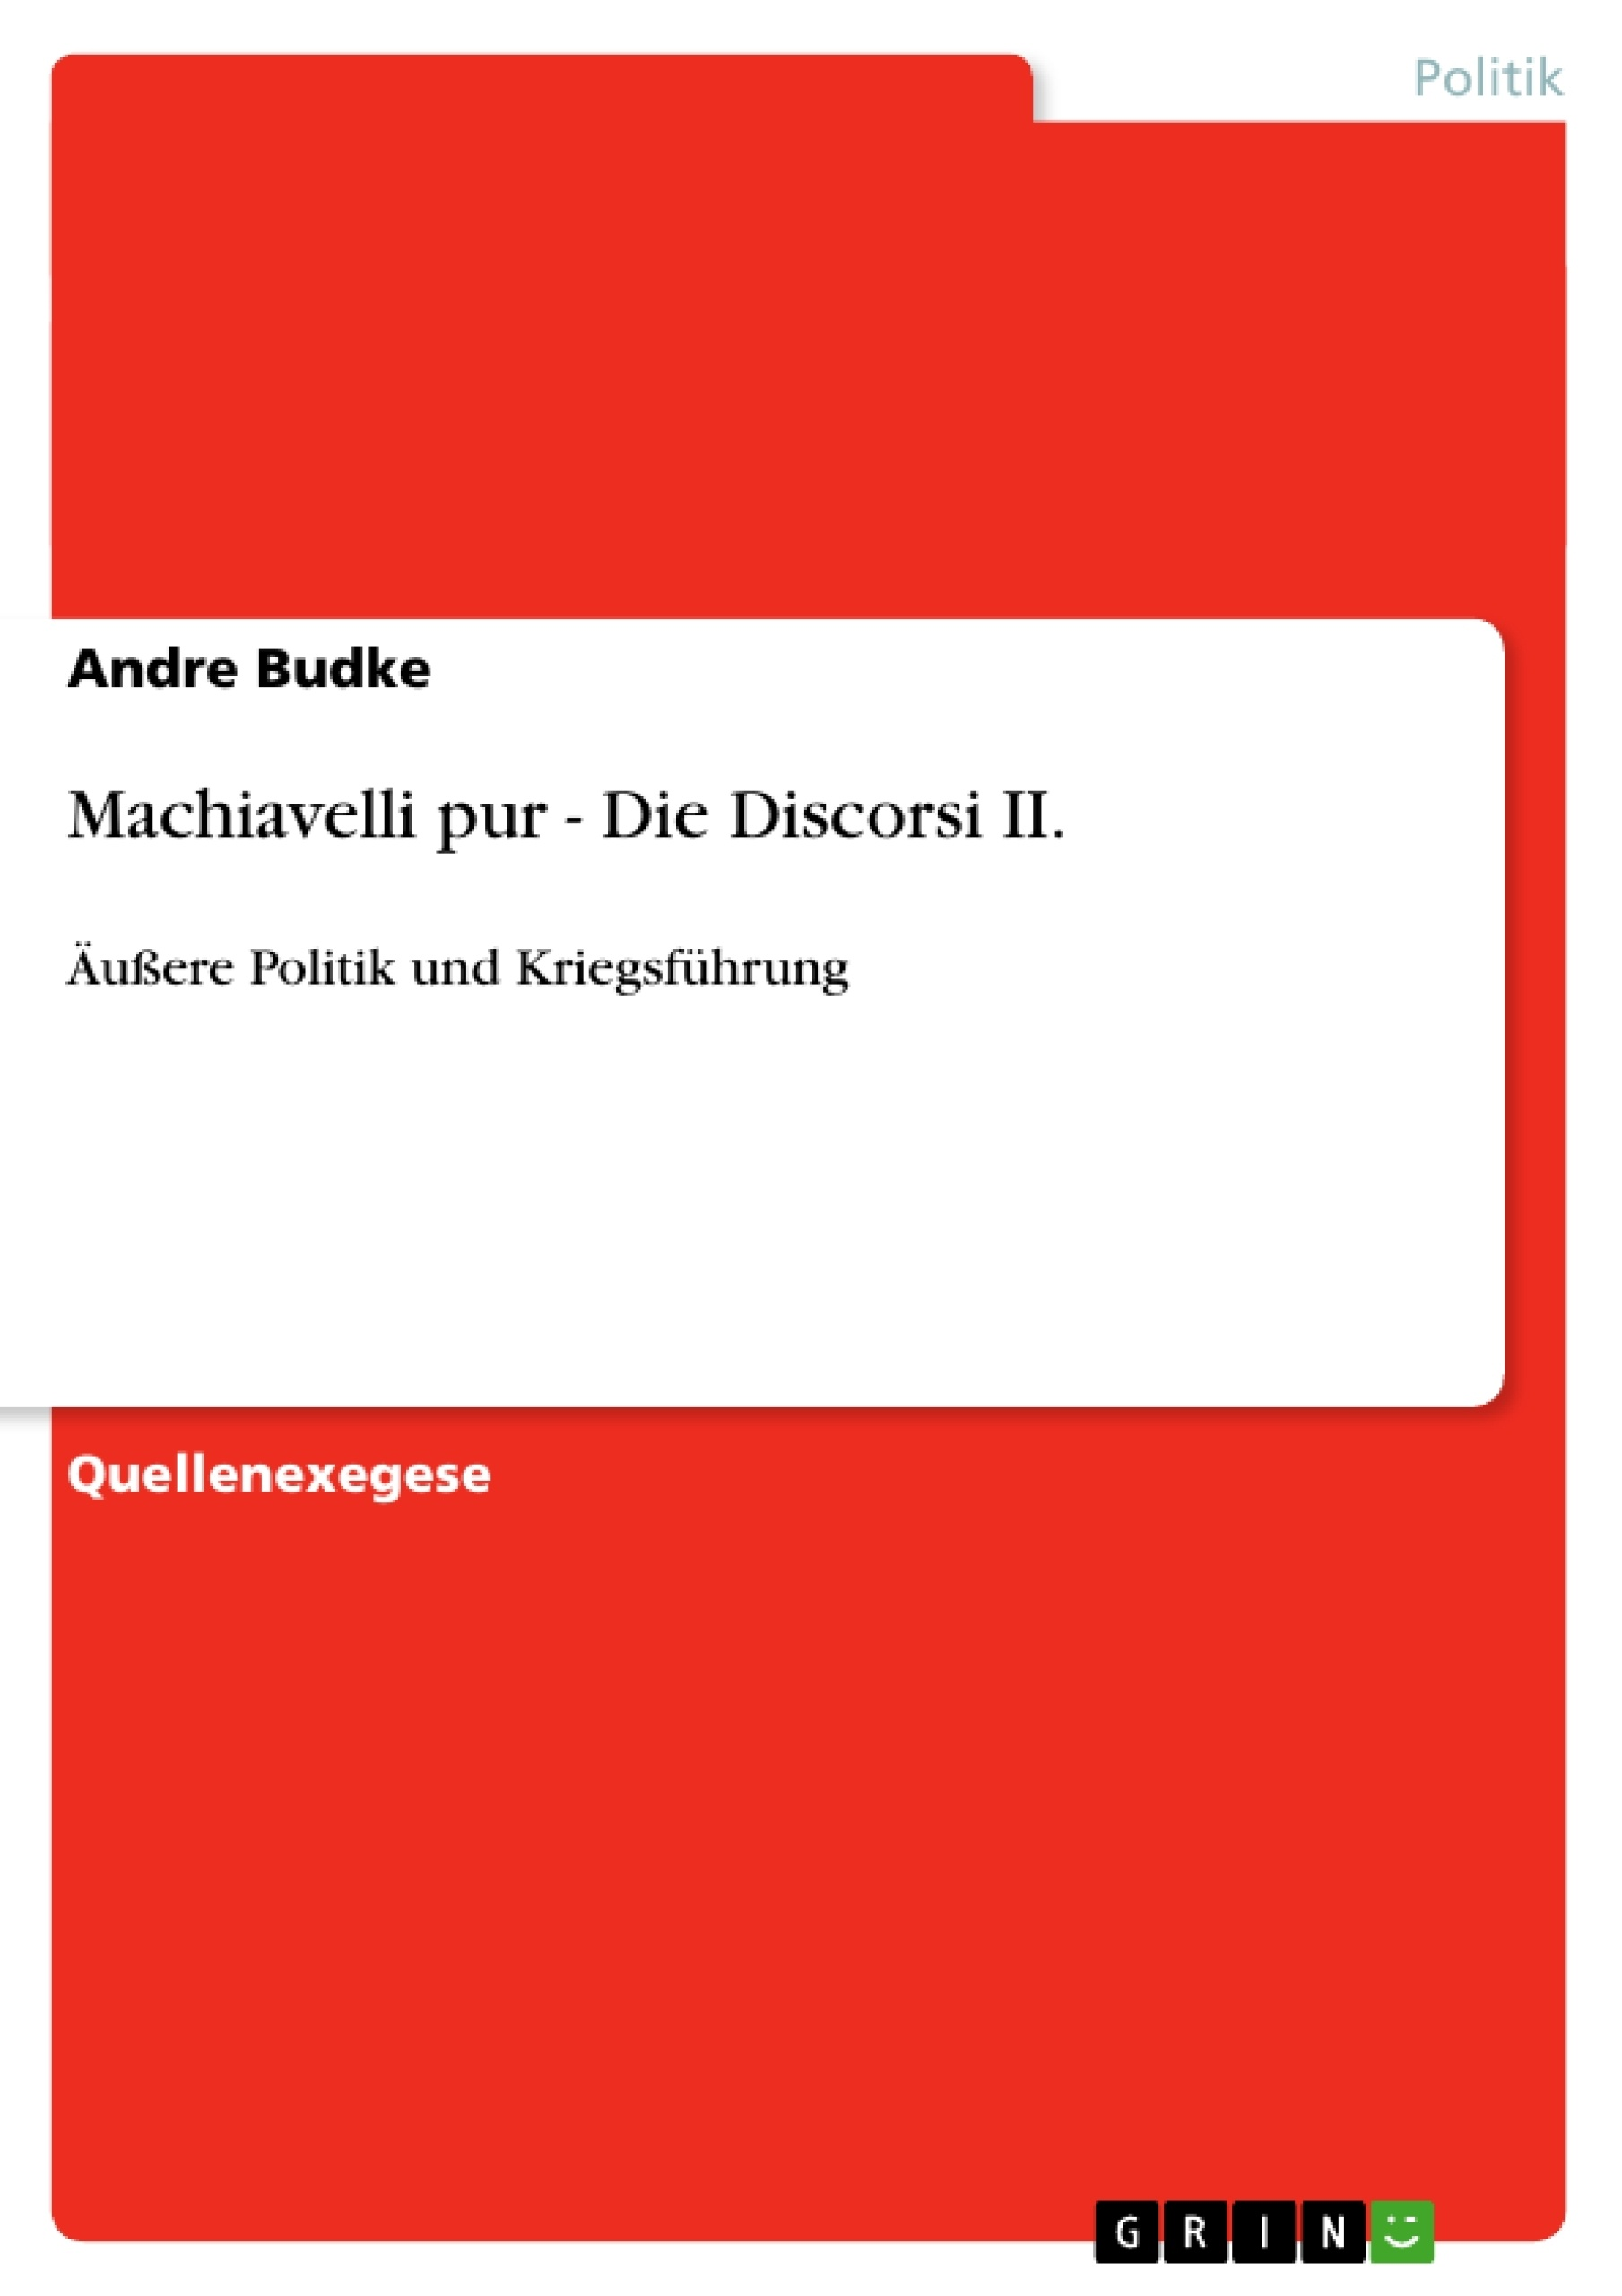 Titel: Machiavelli pur - Die Discorsi II.